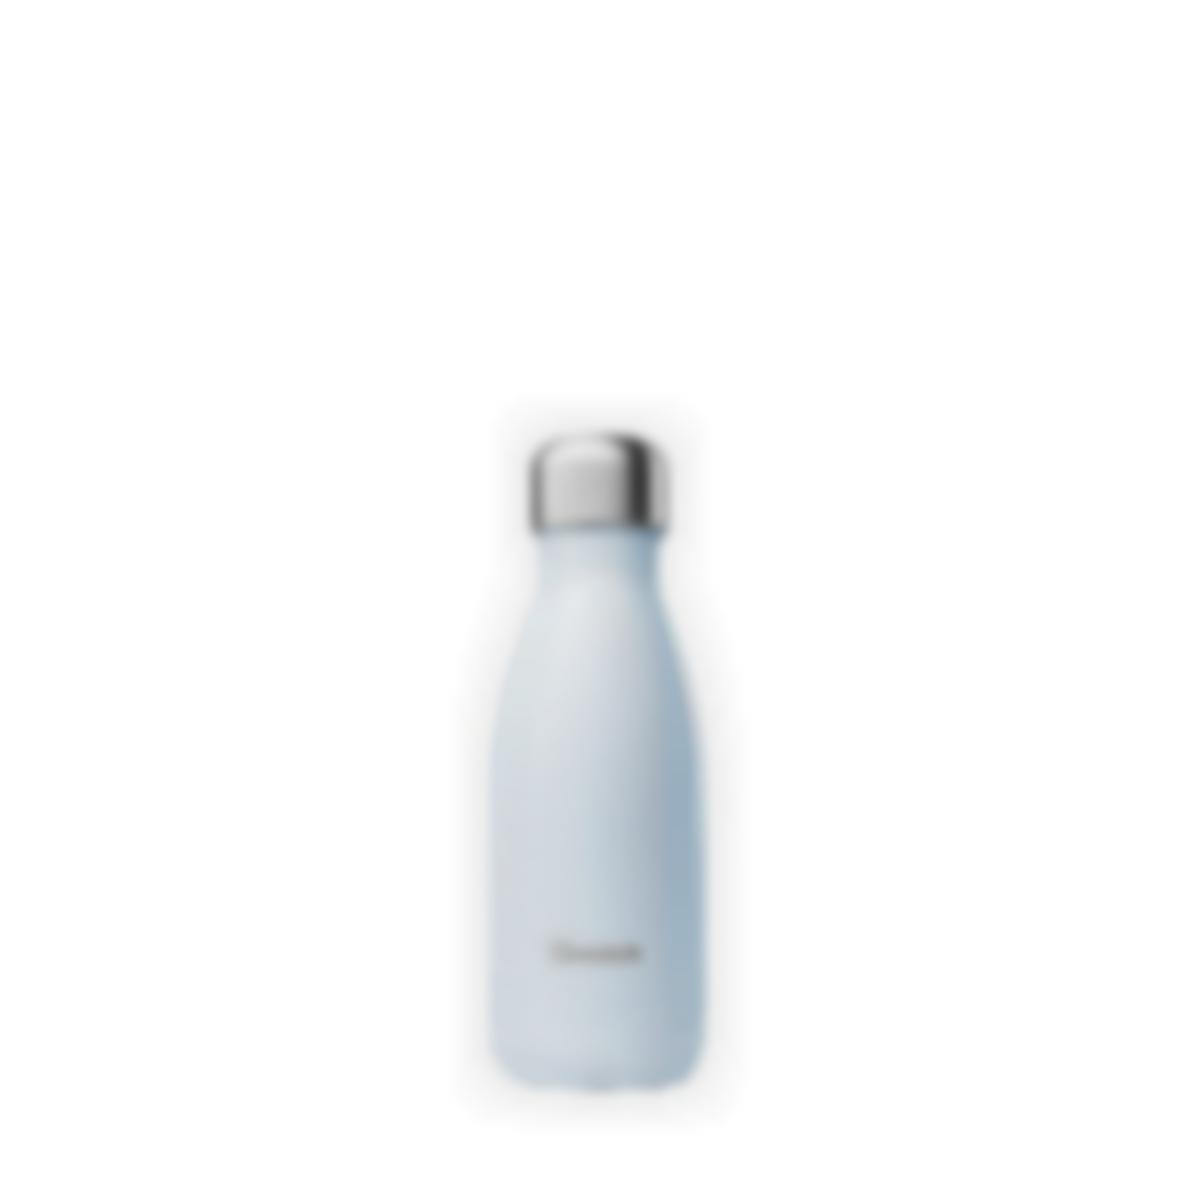 Borraccia Termica acciaio inox pastel blu - 260ml - Qwetch